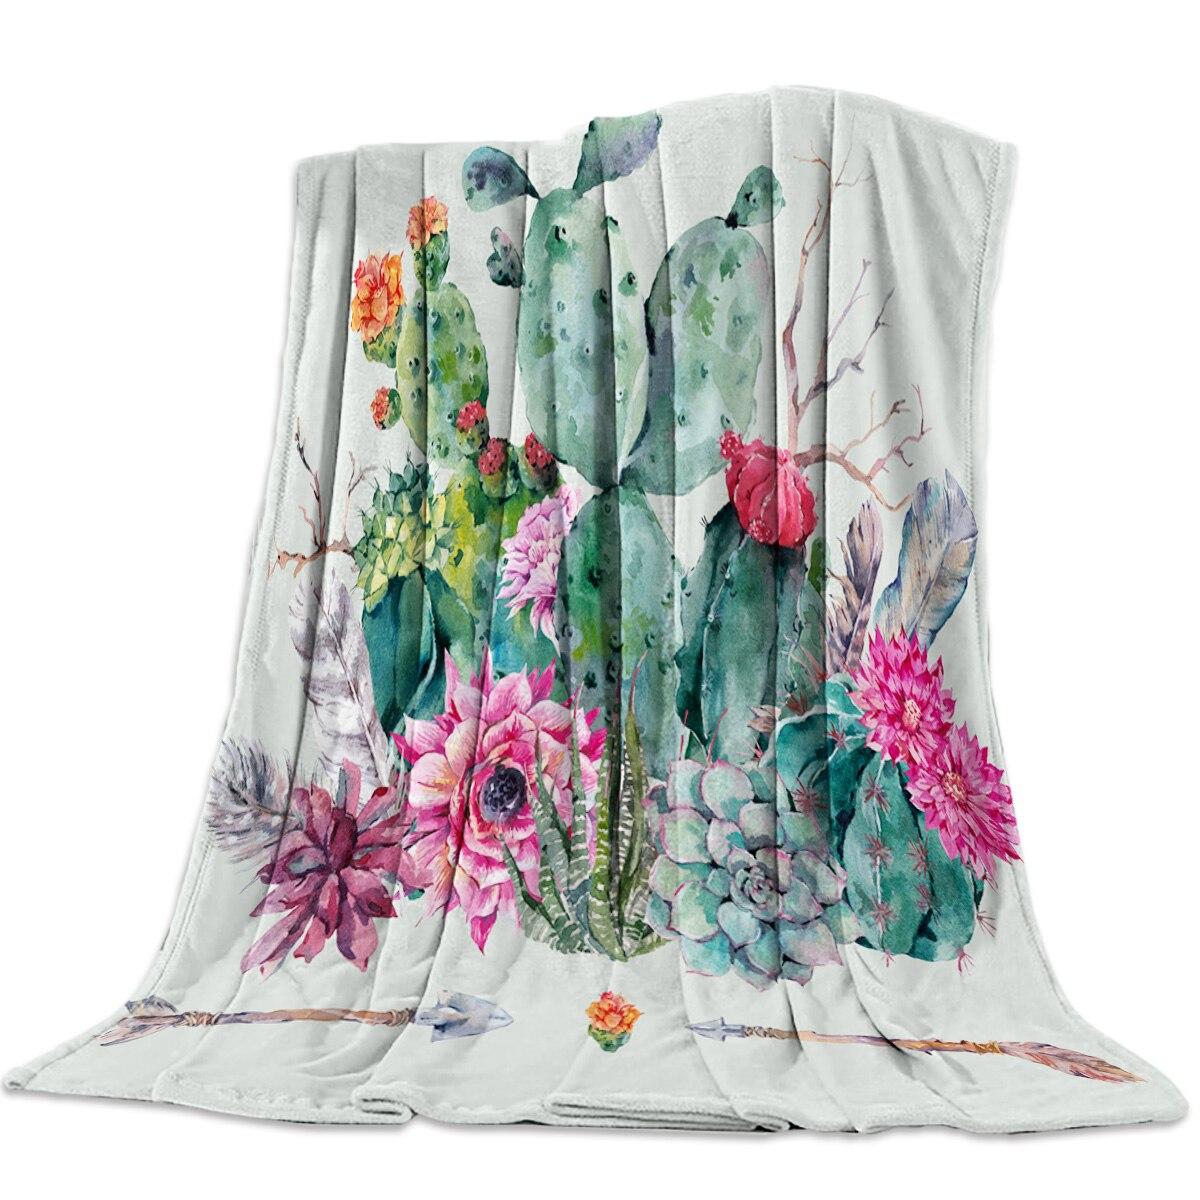 Flannel Blankets Cactus Flower Green Blanket Cushion Warm Throws on Sofa Bed Home Bedspread Travel Fleece Blanket|Blankets|   - AliExpress